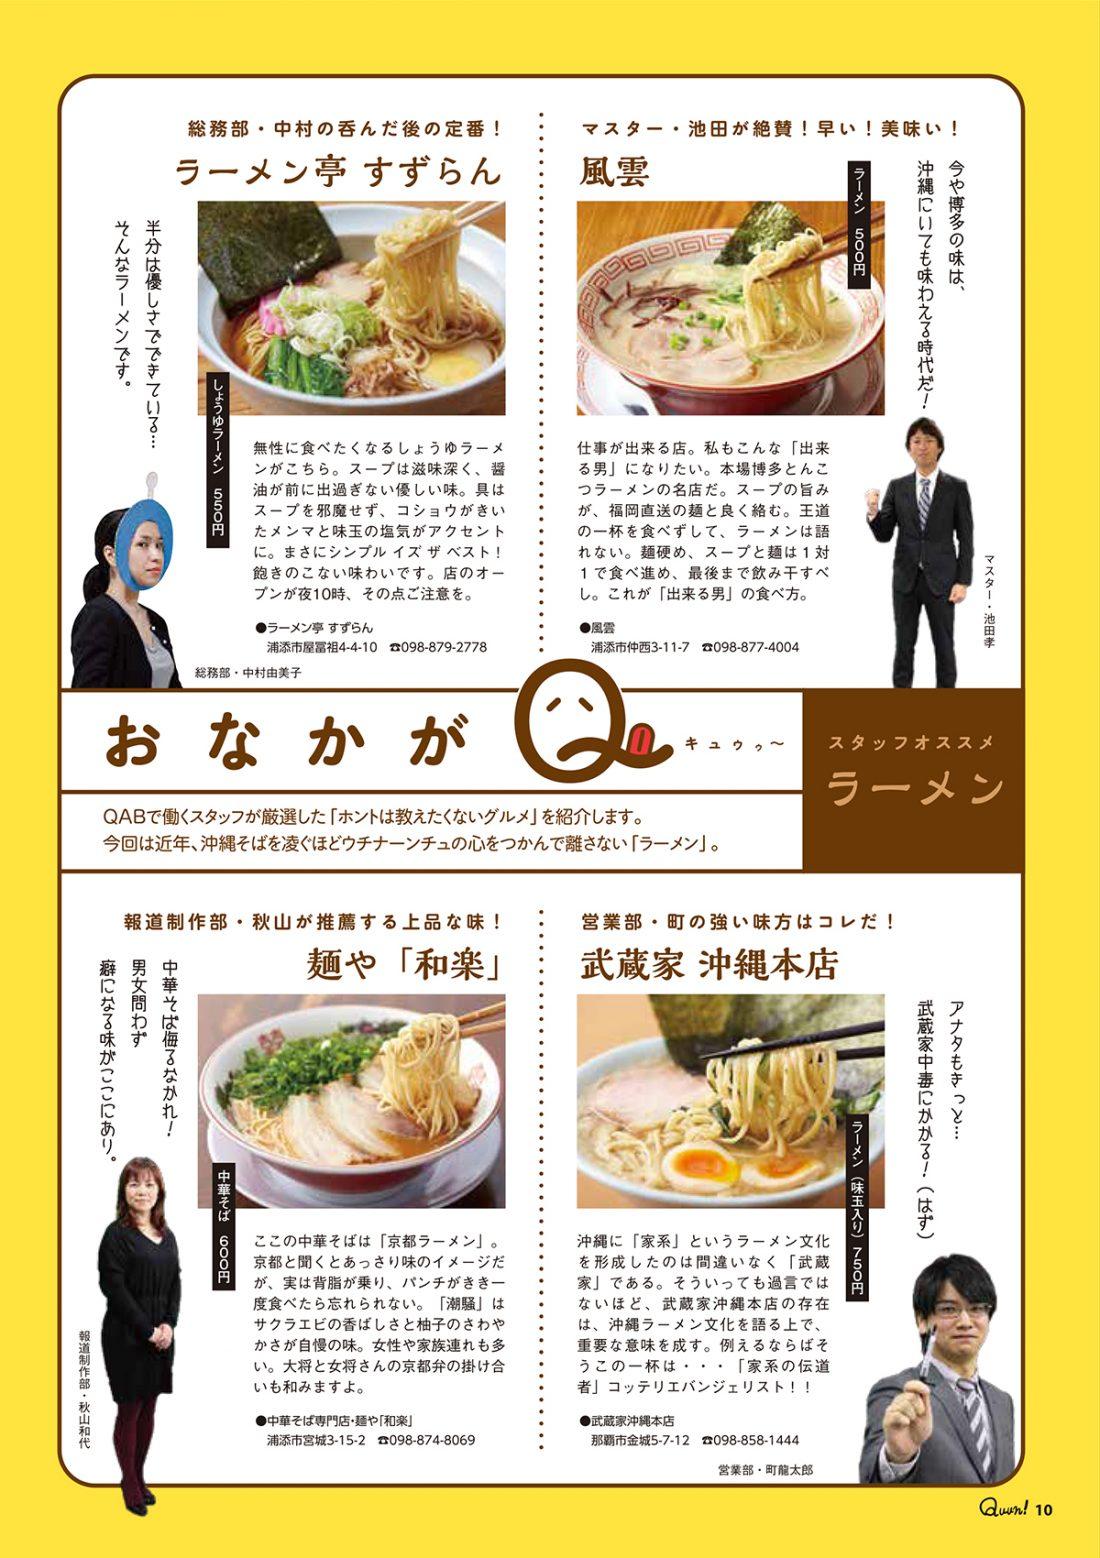 https://www.qab.co.jp/qgoro/wp-content/uploads/quun_0112-1100x1558.jpg